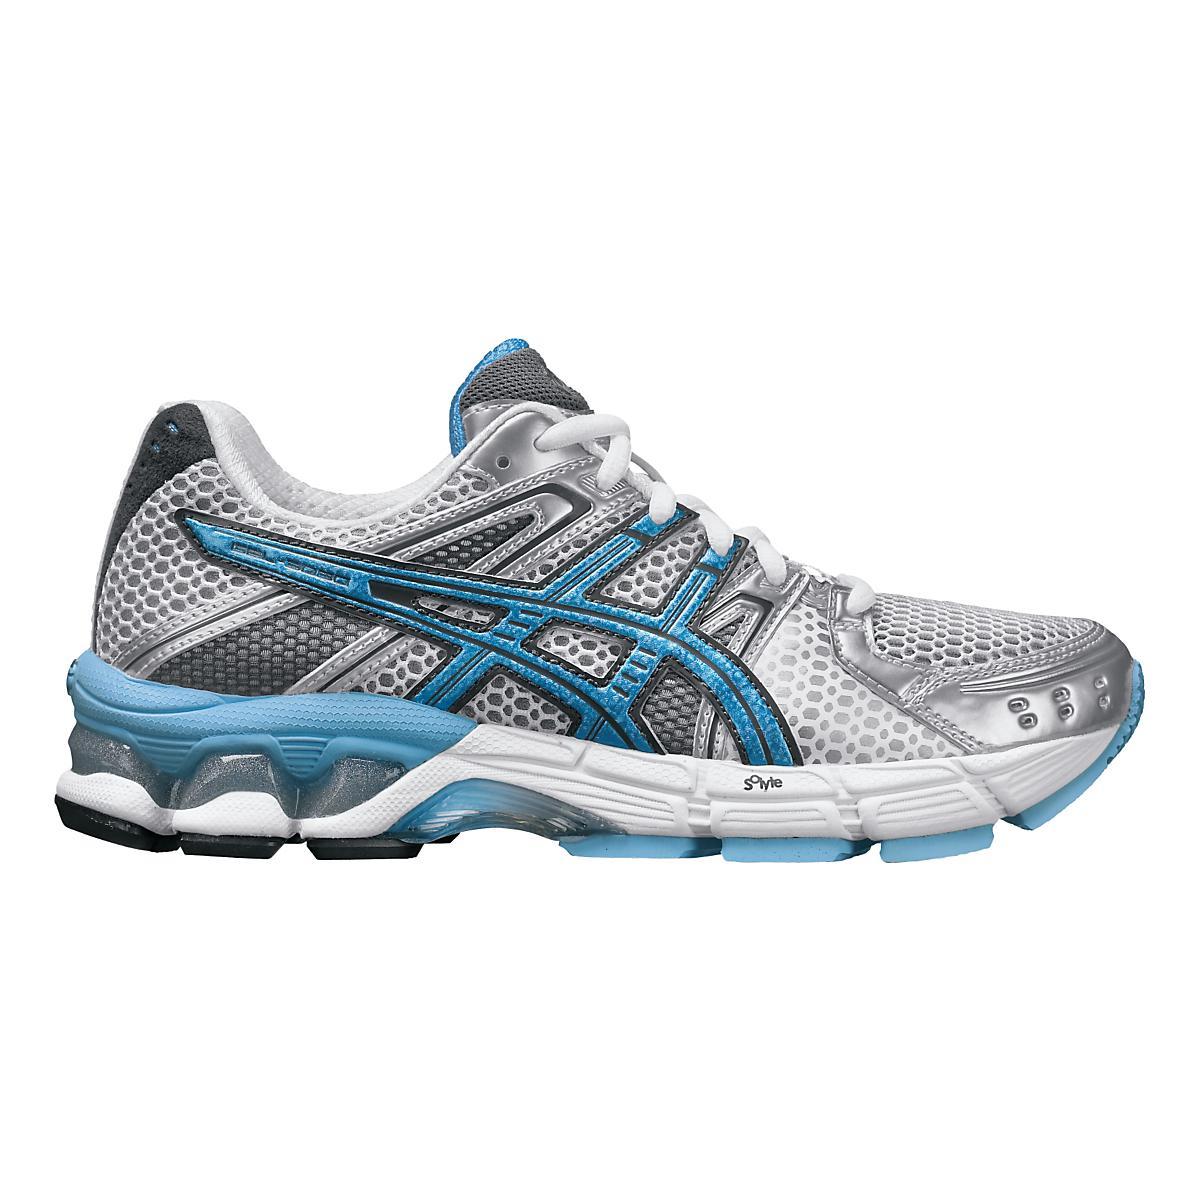 Womens ASICS GEL-3030 Running Shoe at Road Runner Sports c266483130